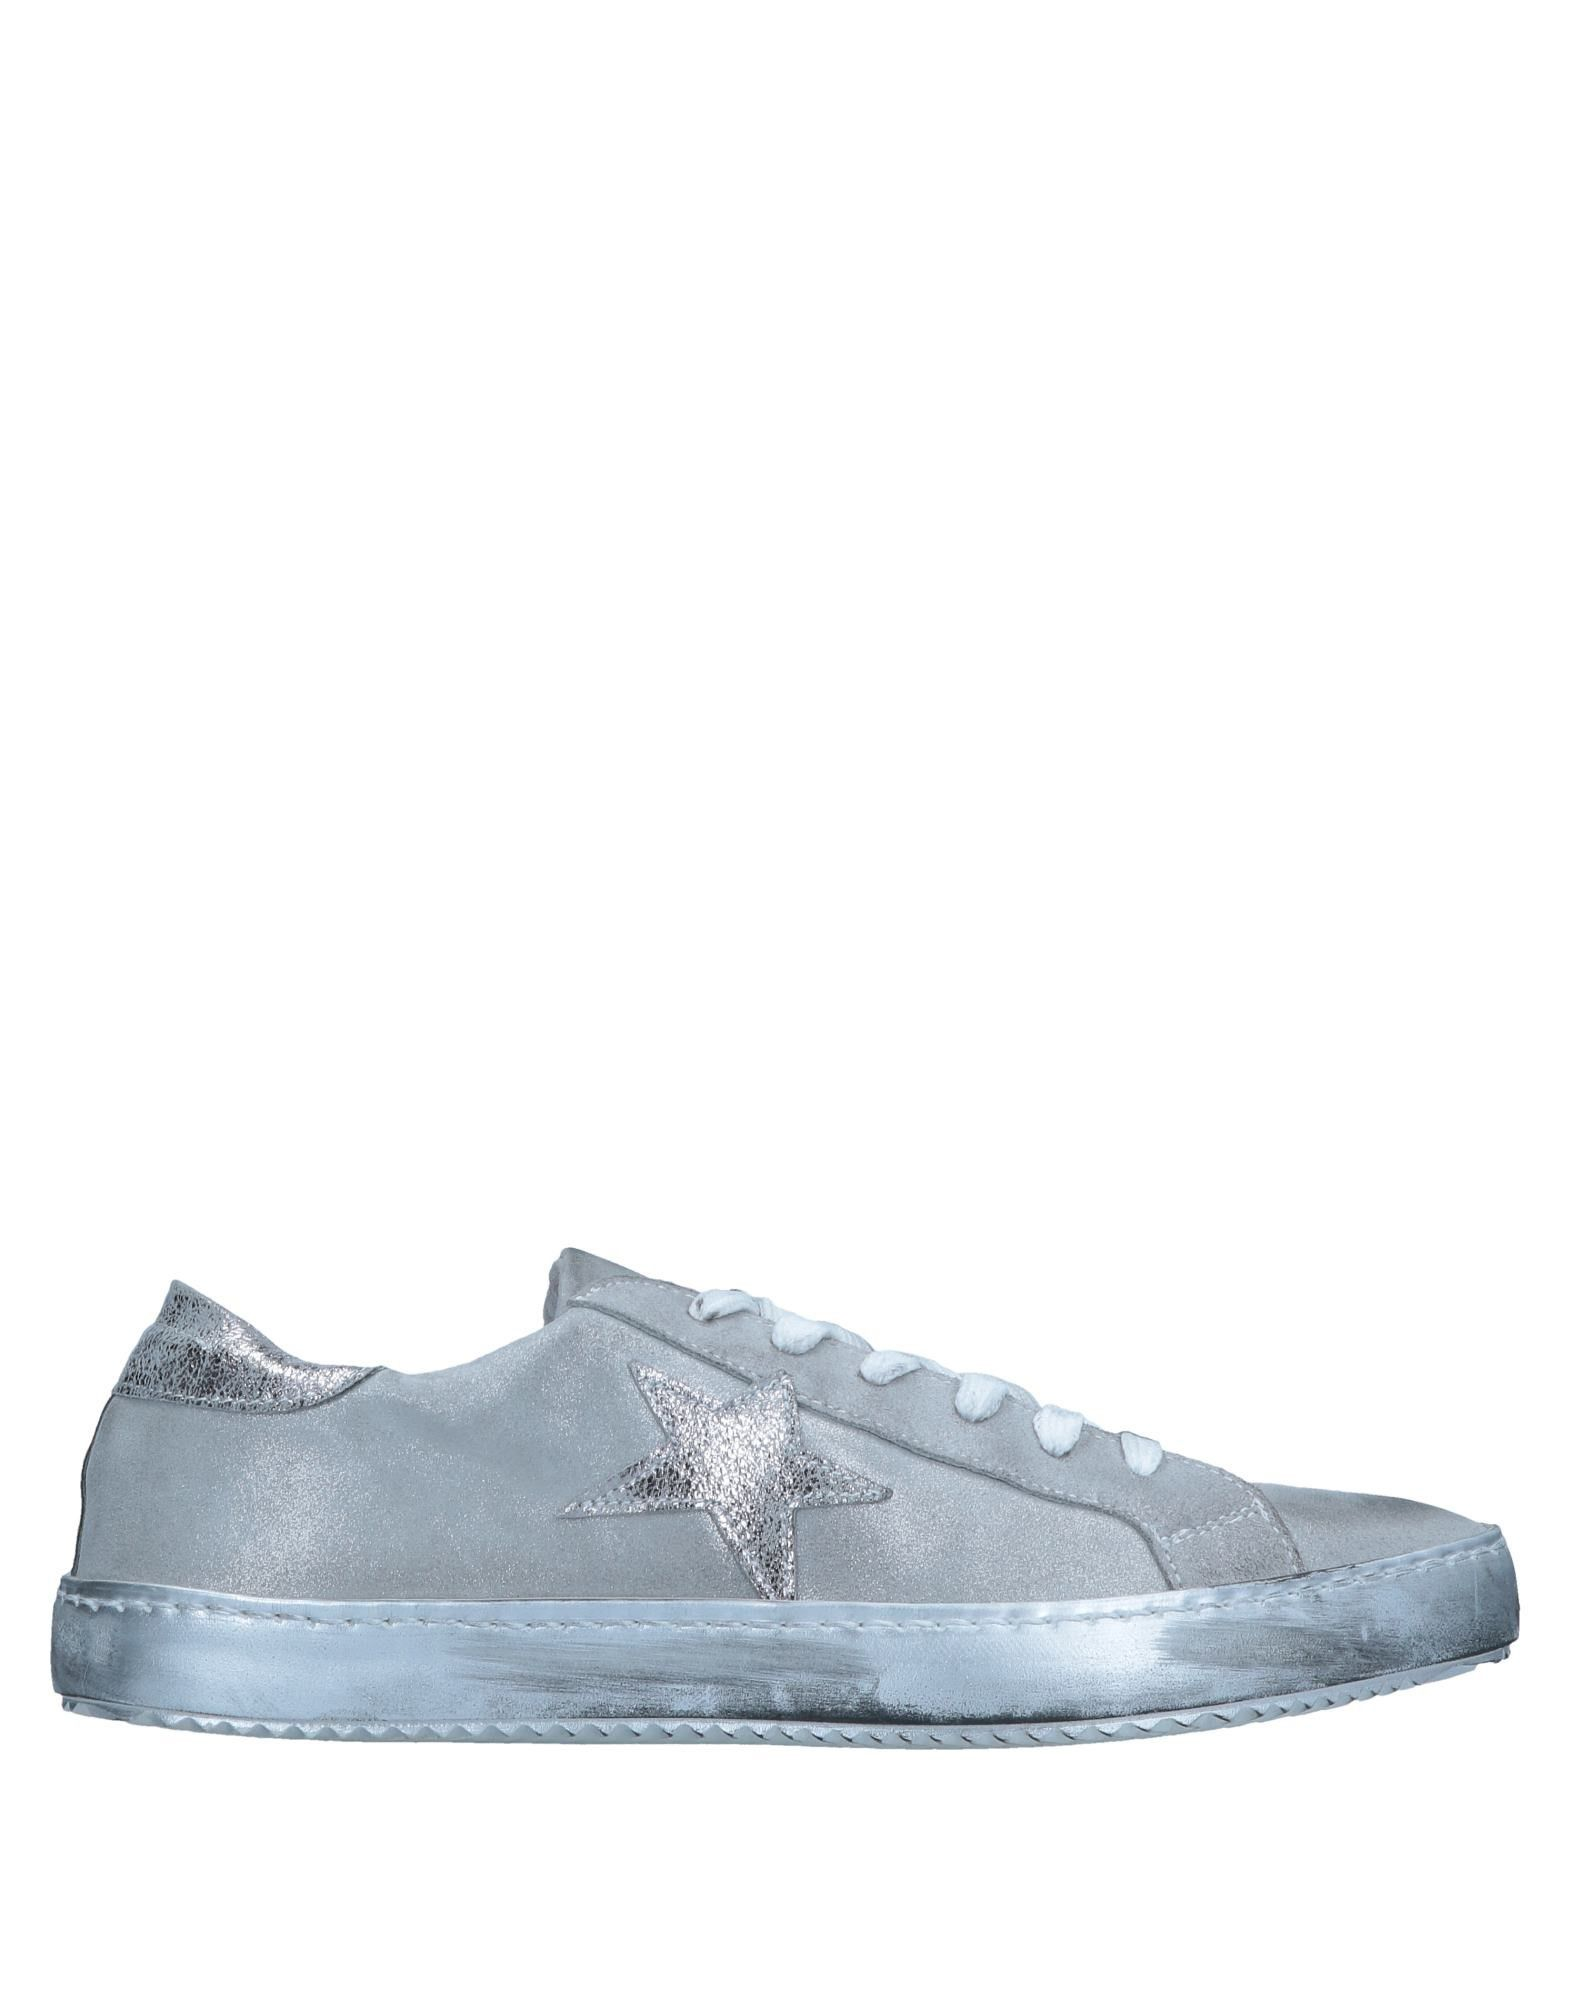 Ovye' By Cristina Lucchi Sneakers Damen  11545633WK Gute Qualität beliebte Schuhe